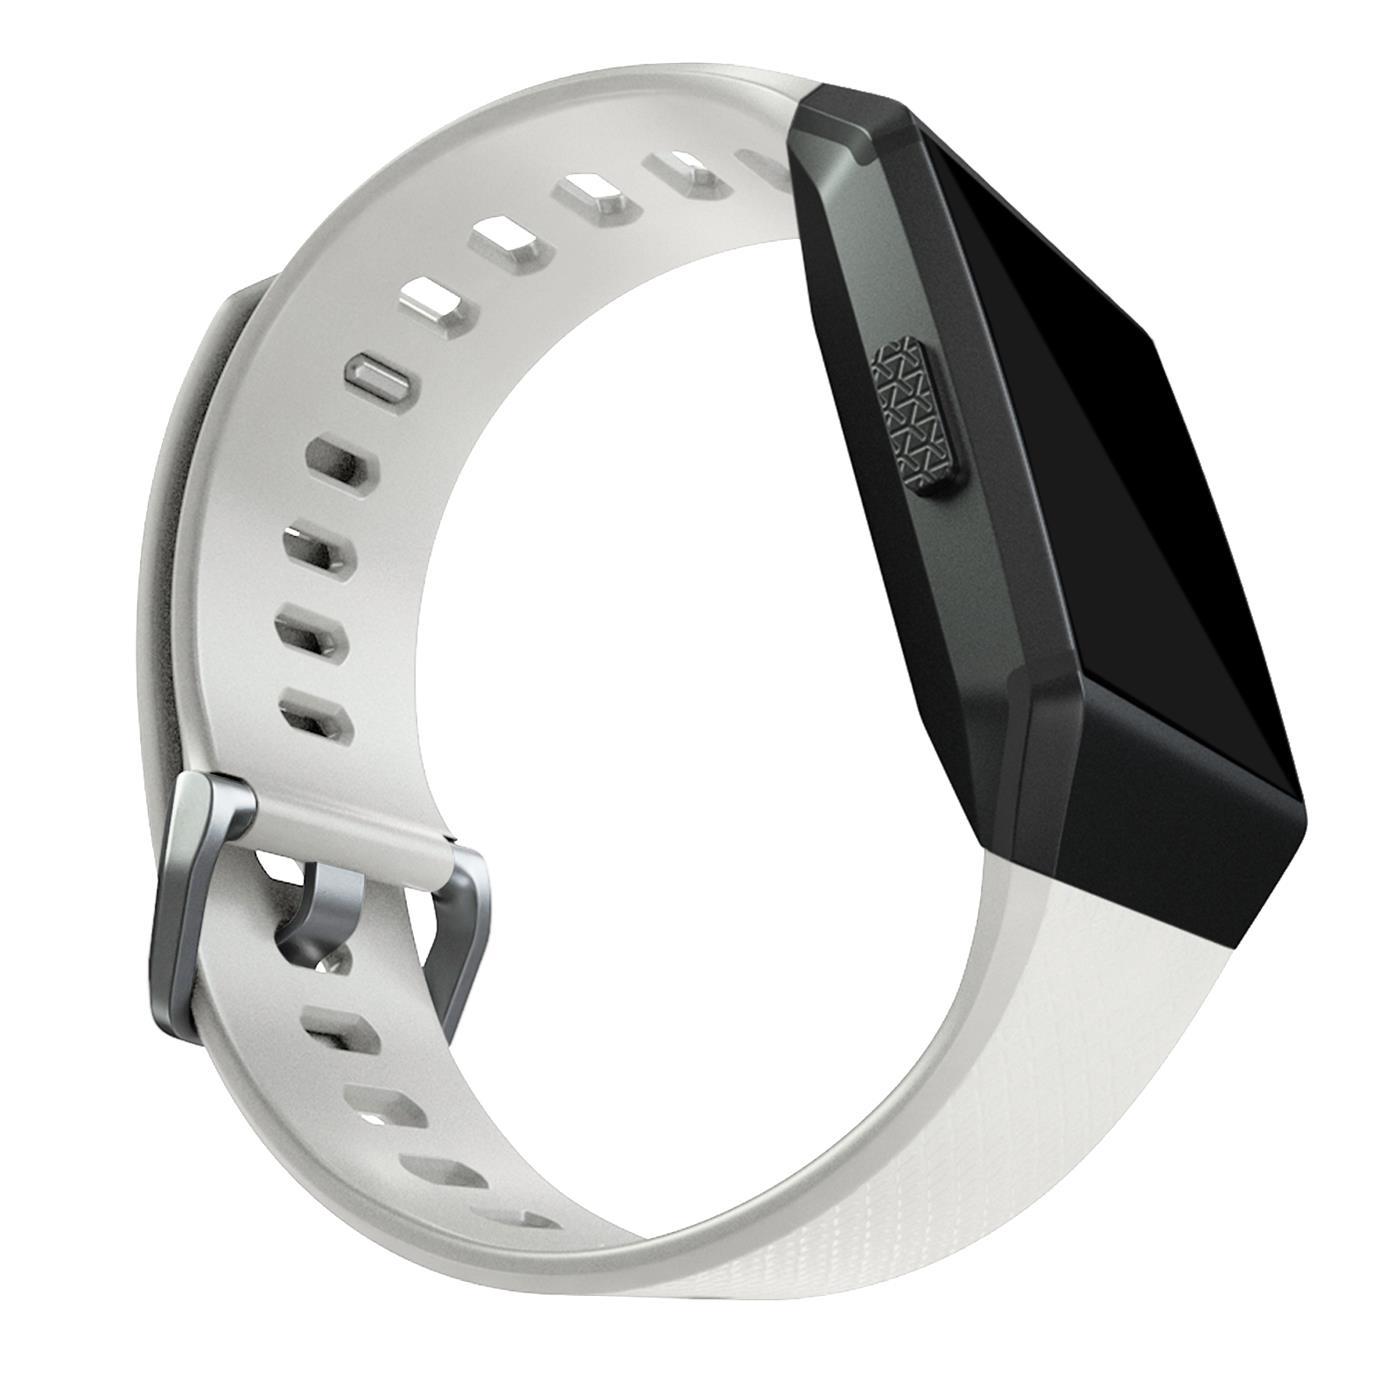 Fitbit-Ionic-Gr-S-L-Ersatz-Silikon-Armband-Uhren-Sport-Band-Fitness-Tracker Indexbild 24